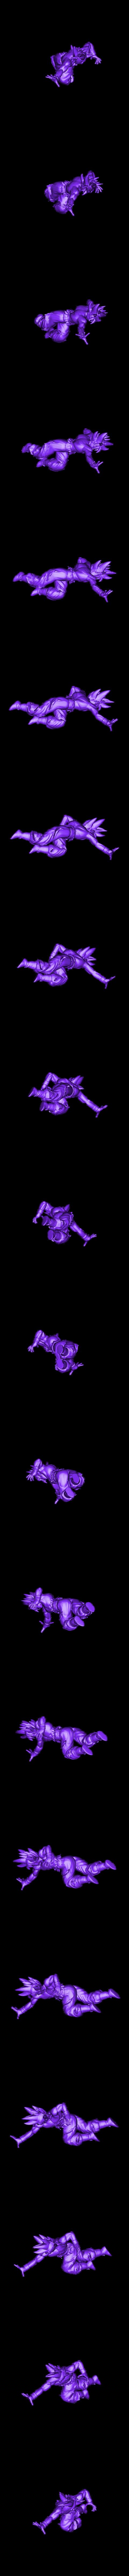 PM3D_goku pose_1.stl Download STL file GOKU ULTRA INSTINCT COMPLETE POSE • 3D printing model, adrian5